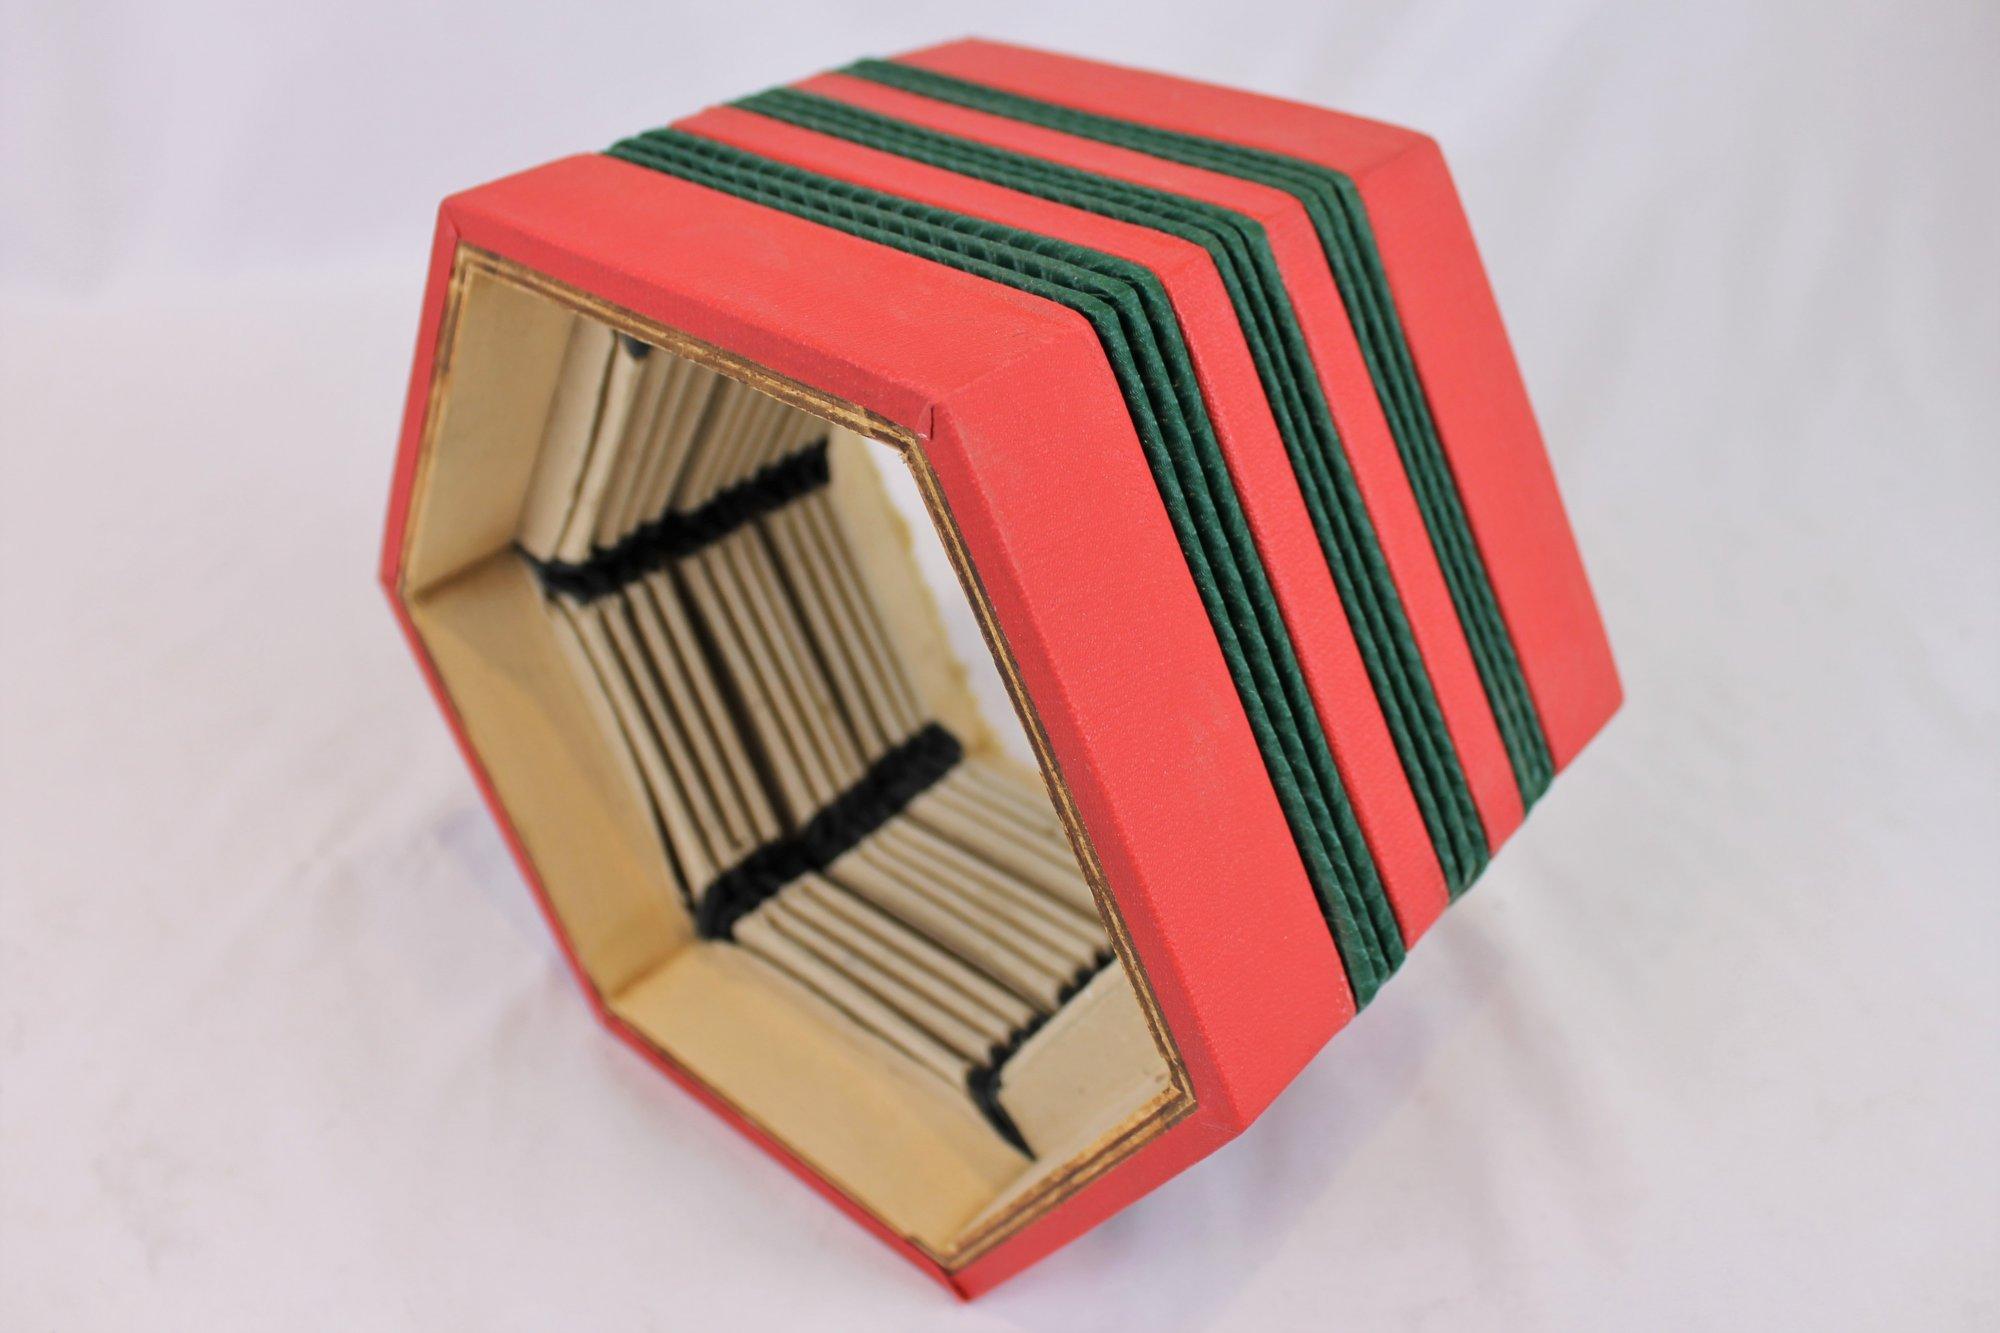 Concertina Part - Bellows 8 x 6.9 x 4.25 13 Folds